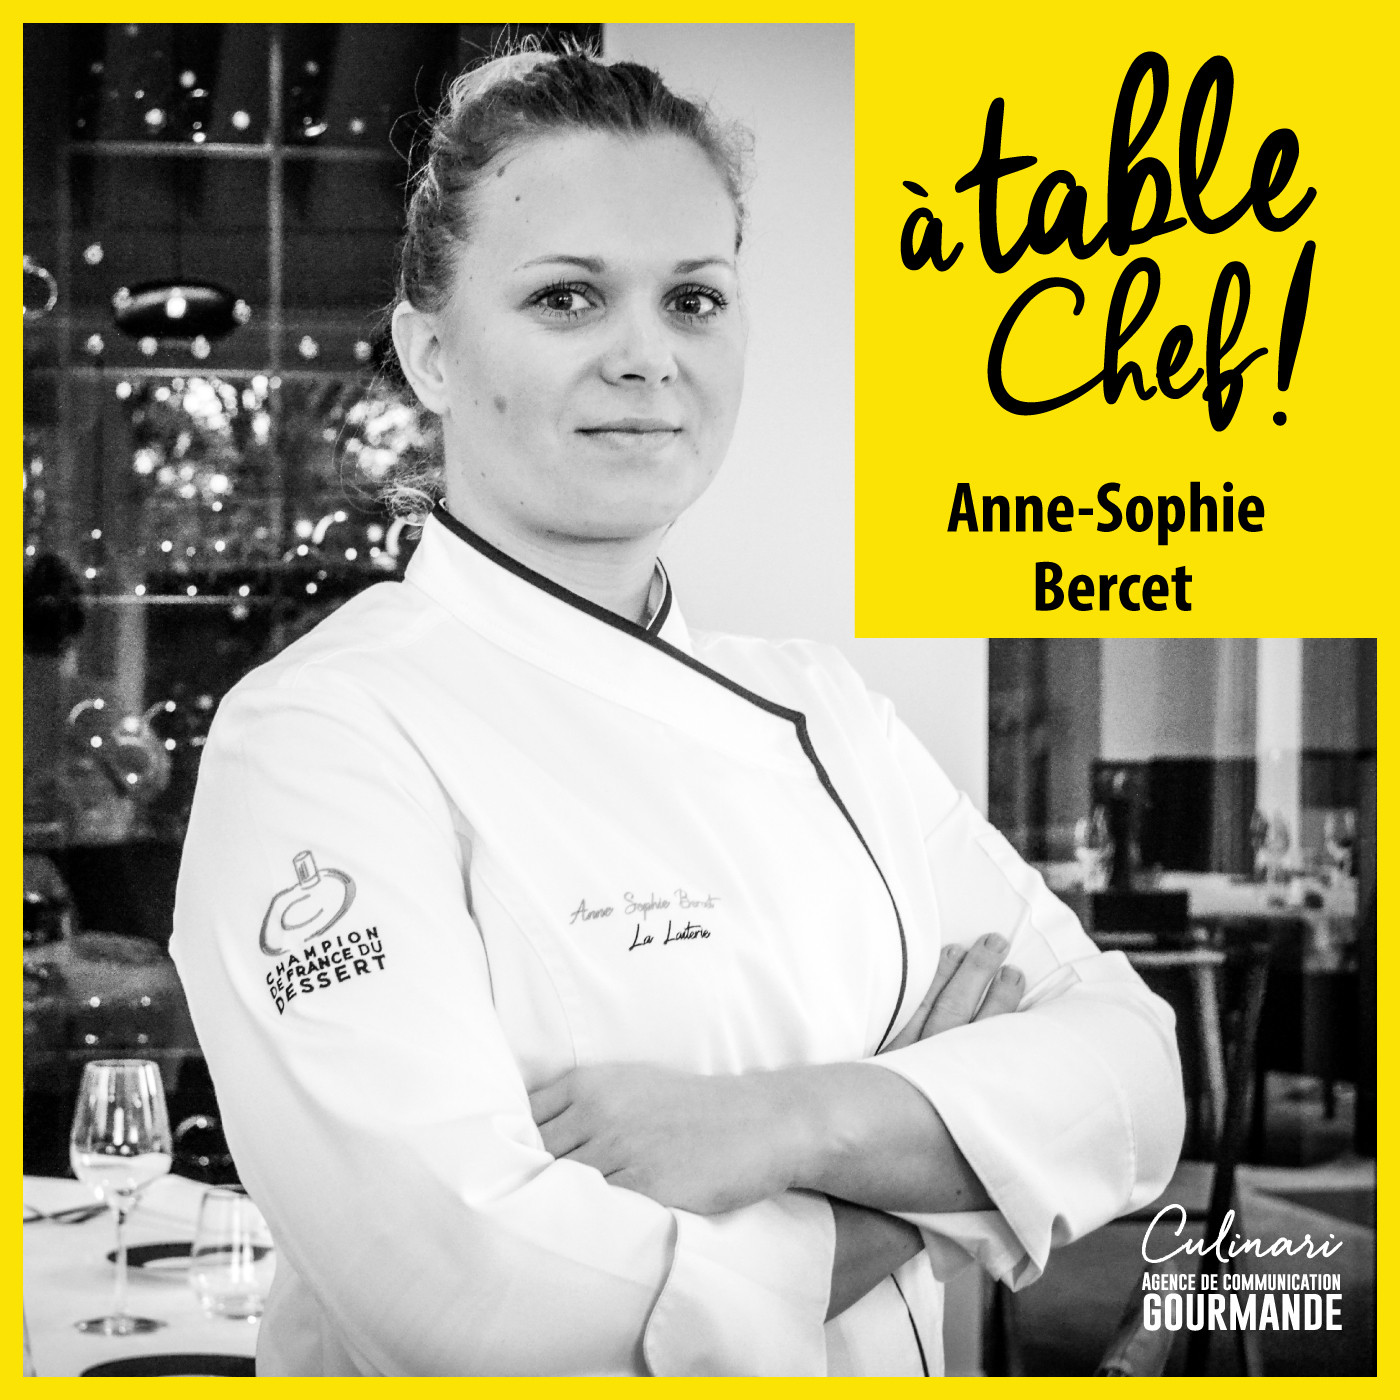 Cheffe Anne-Sophie Bercet